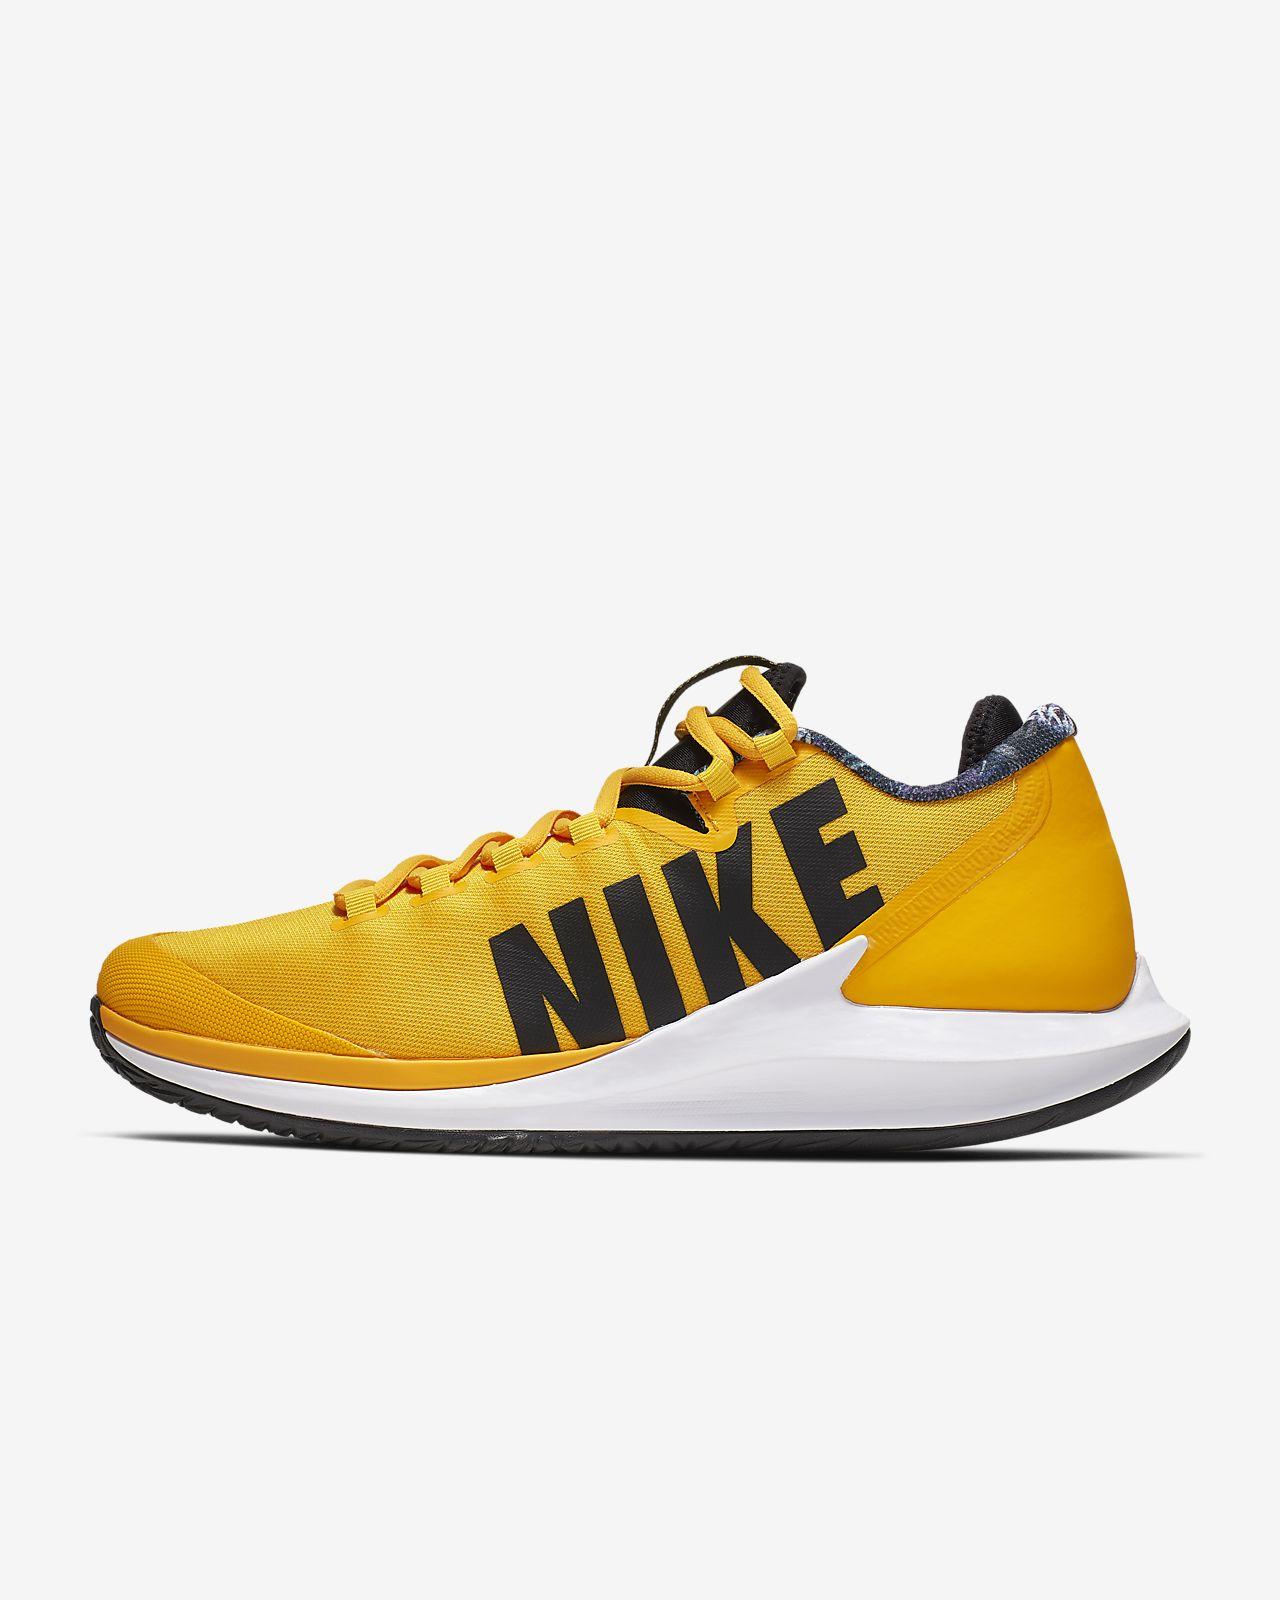 Calzado de tenis para hombre NikeCourt Air Zoom Zero